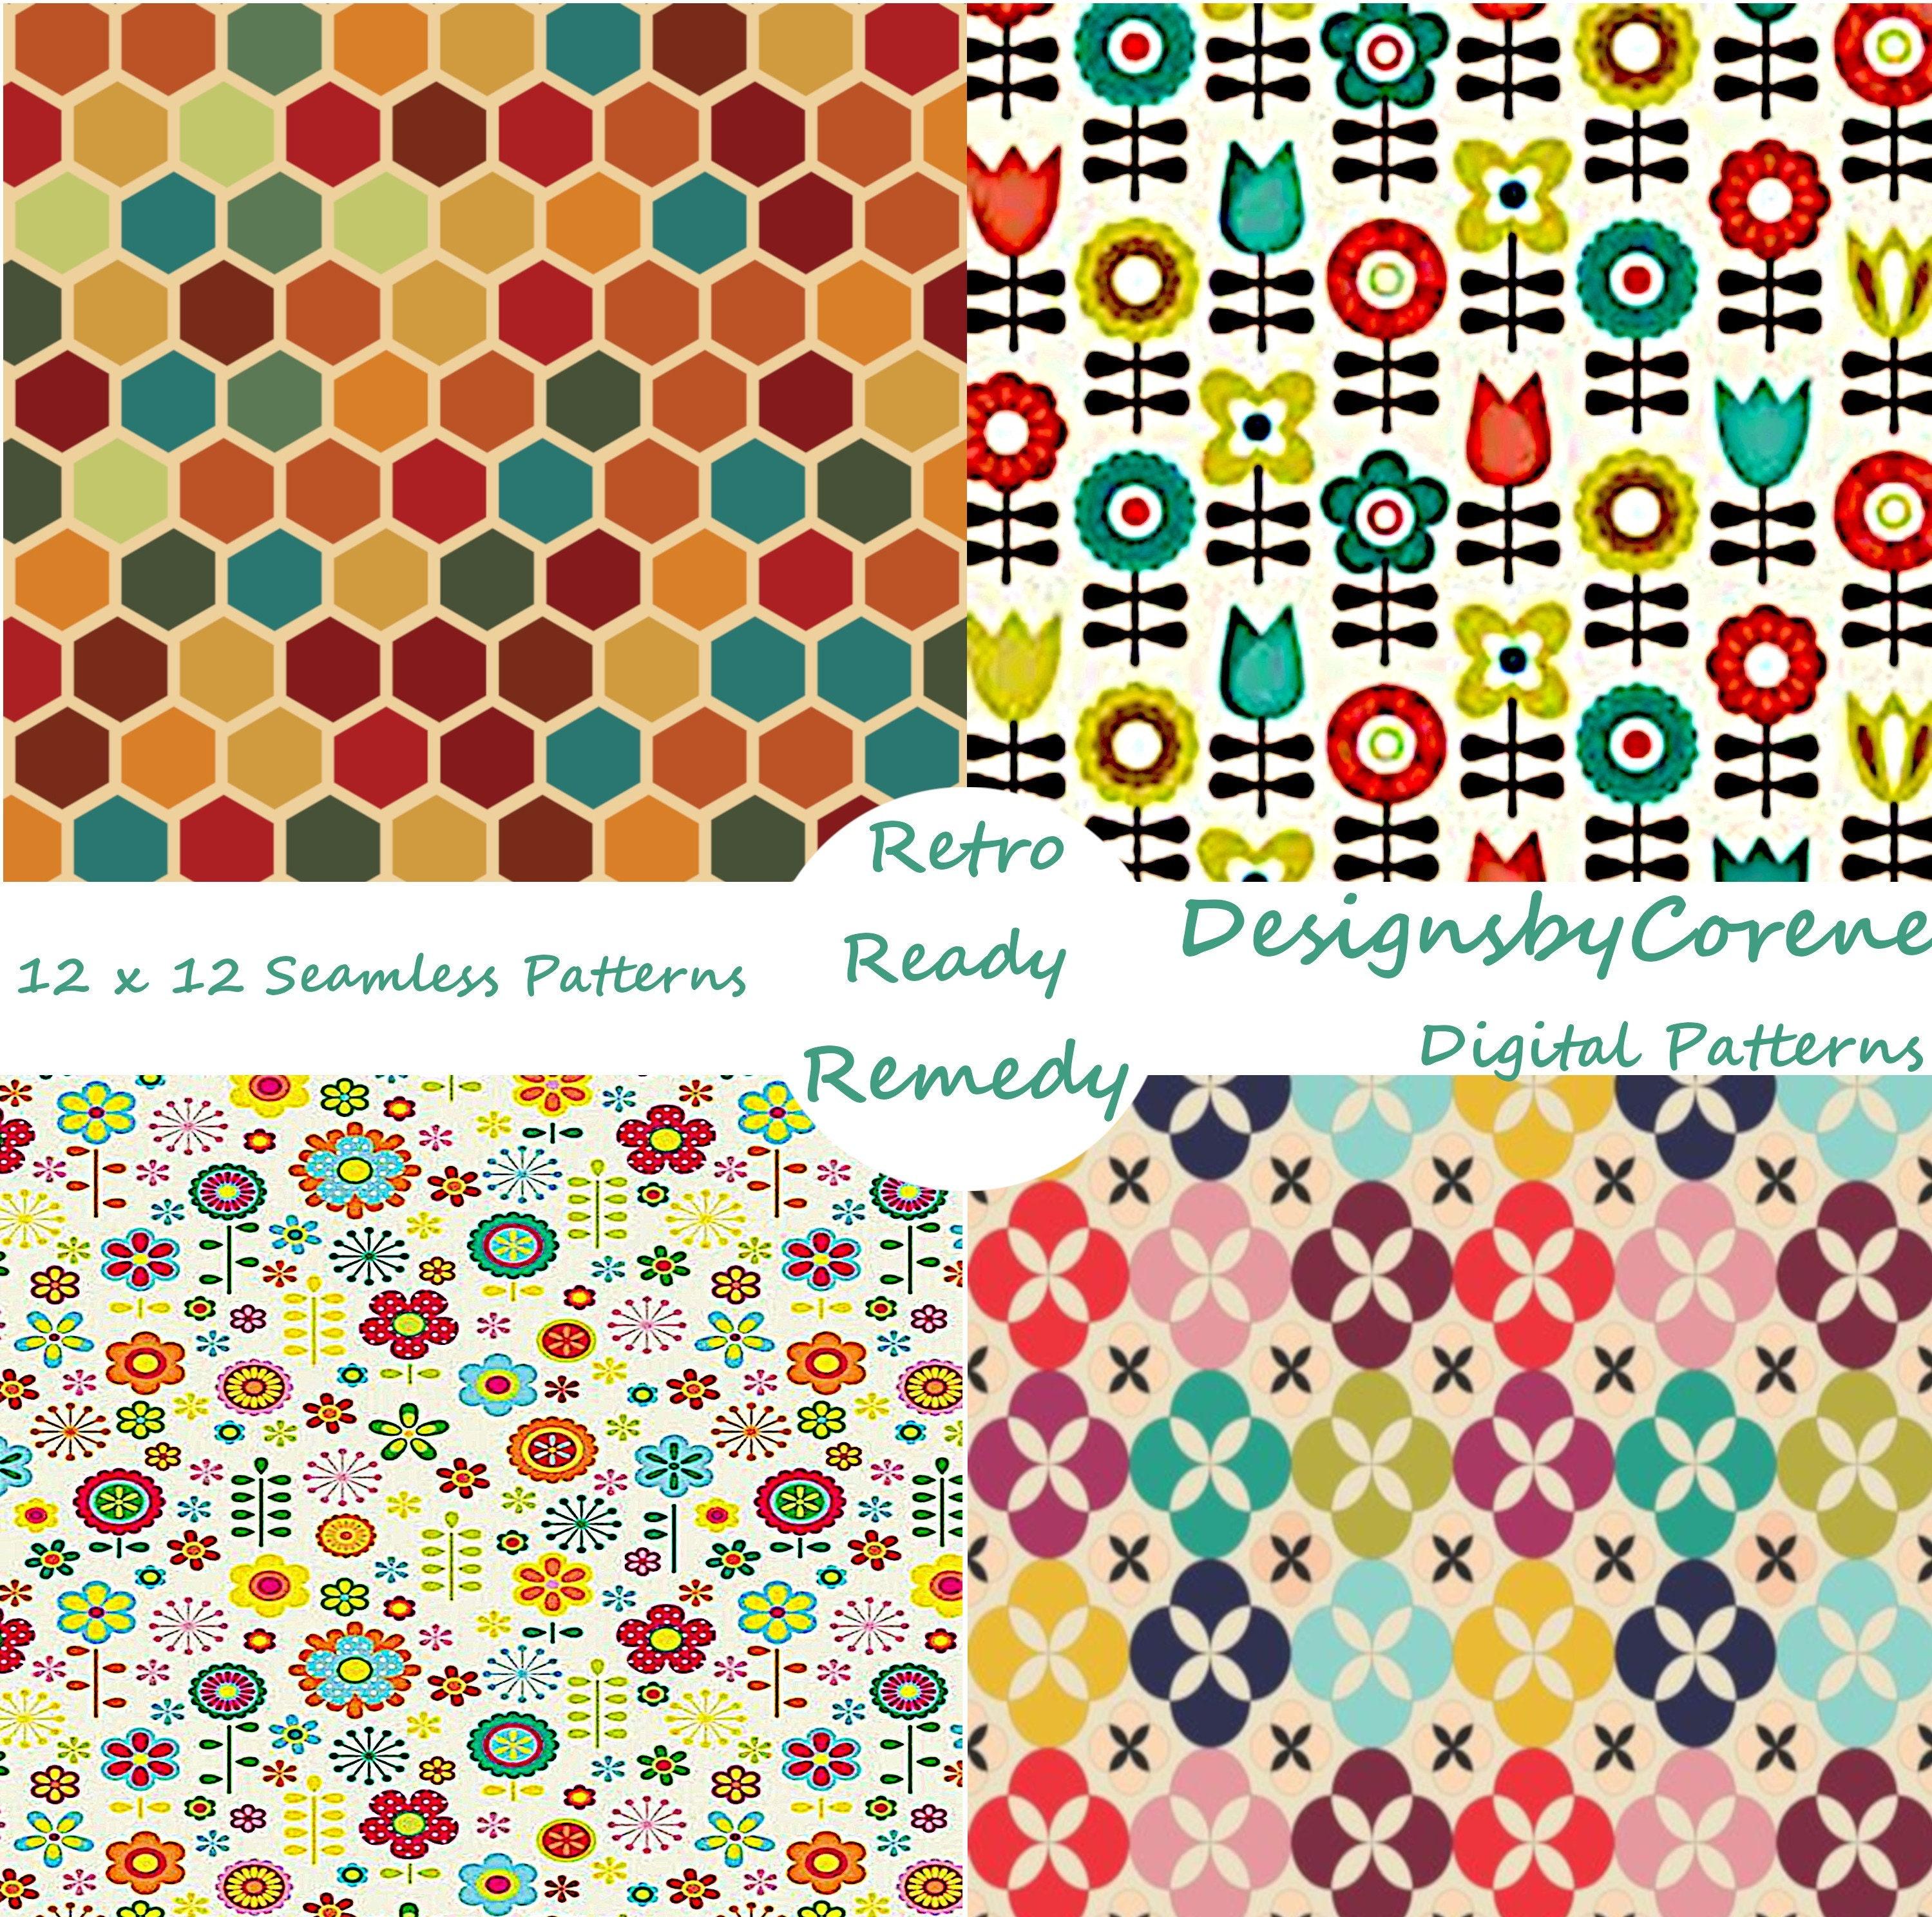 Set of Four Seamless Retro Designs Pattern Paper, Seamless Patterns,  Digital Paper, Scrapbook